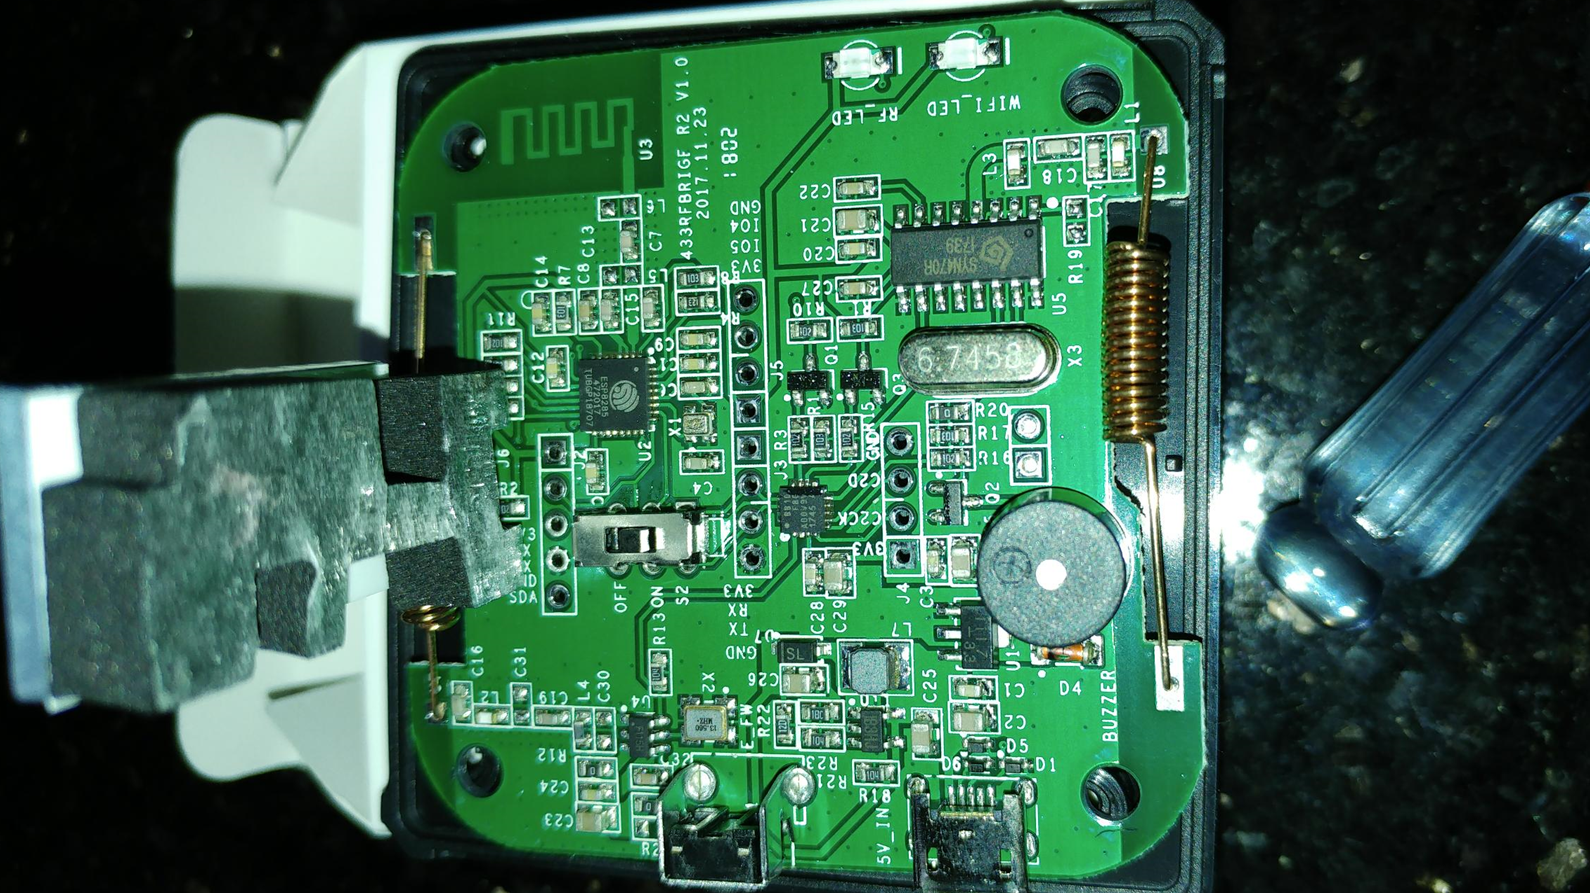 Sonoff RF 433 On R2 V1 0 Boards, hardware hack needed